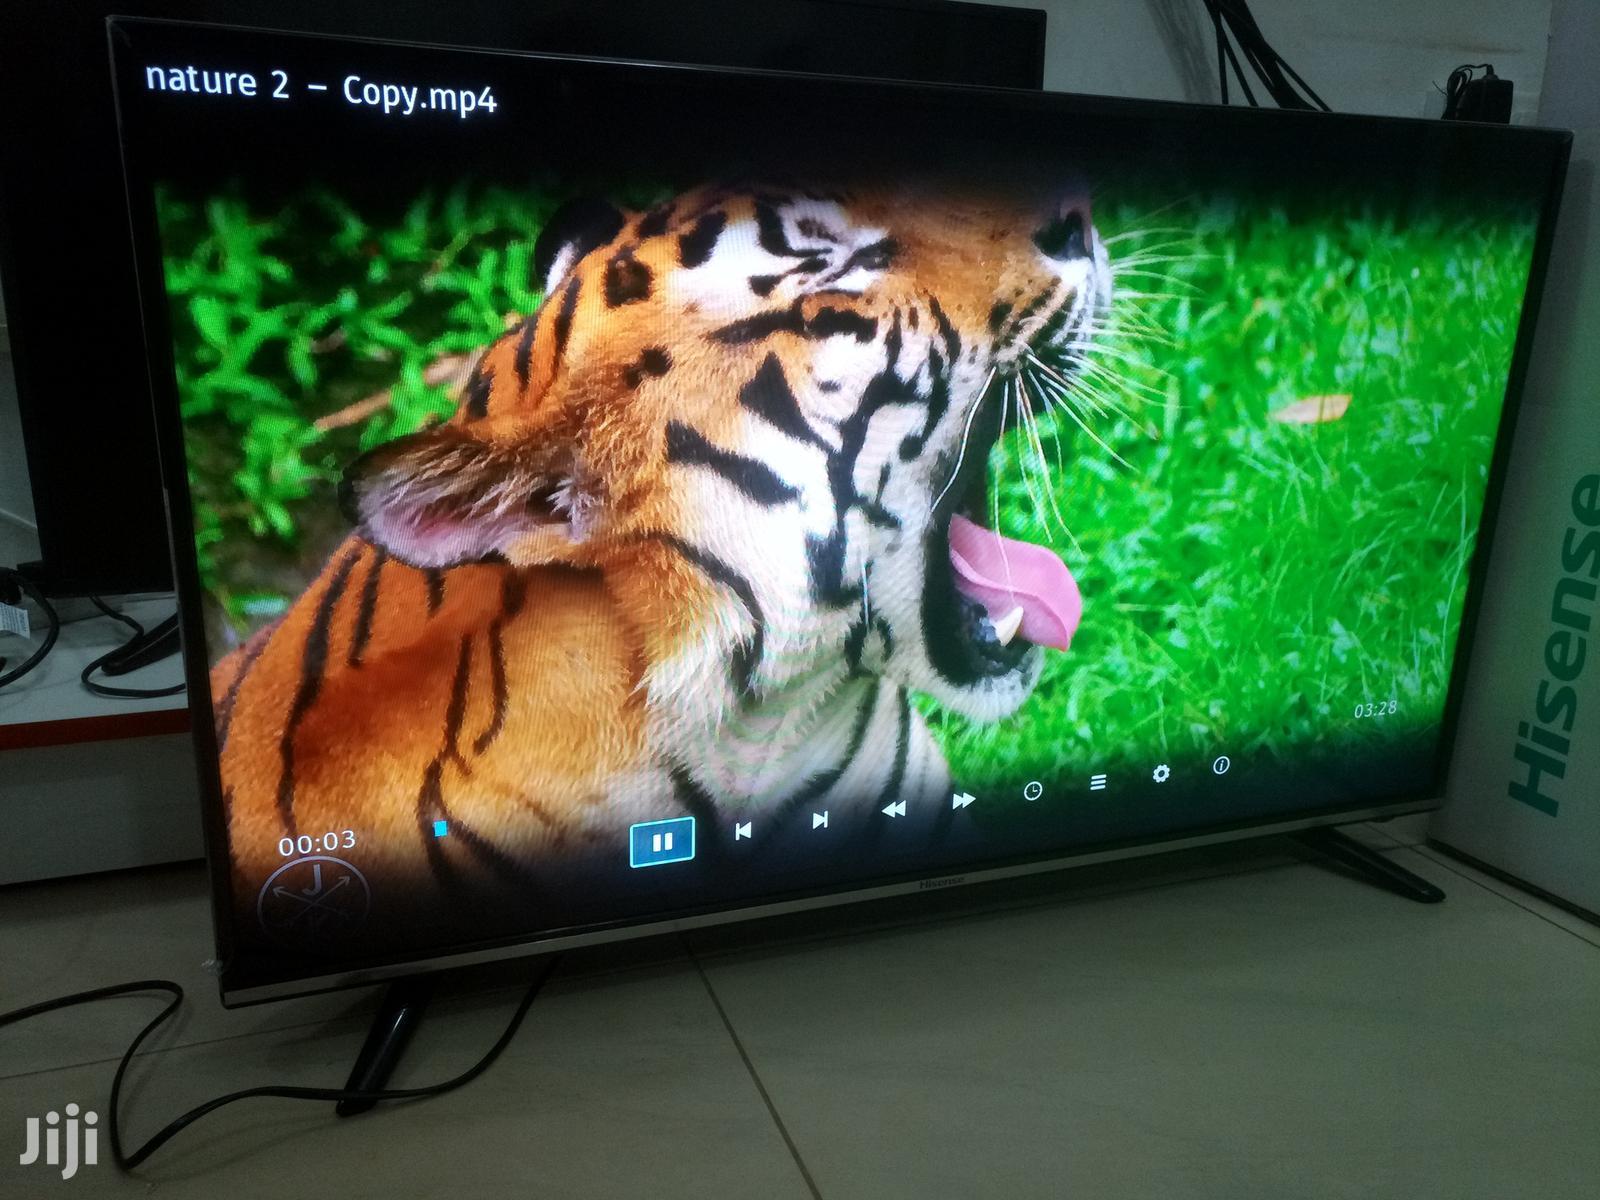 Hisense Smart Flat Screen Digital TV 40 Inches